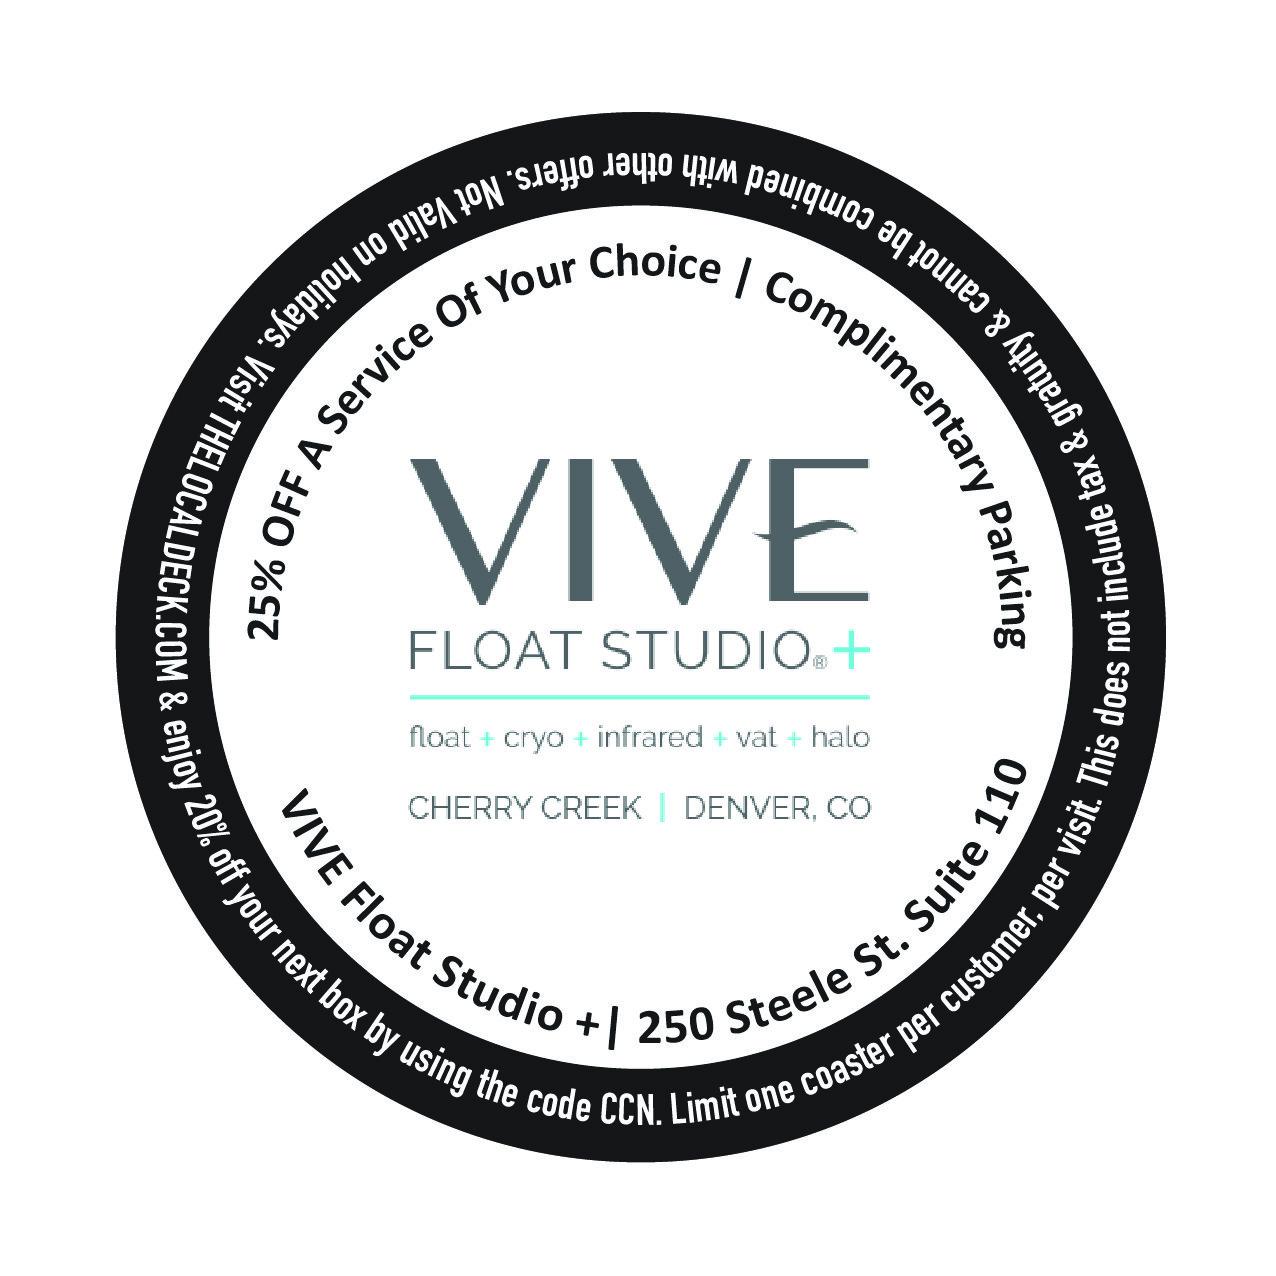 Vive Float Studio.jpg